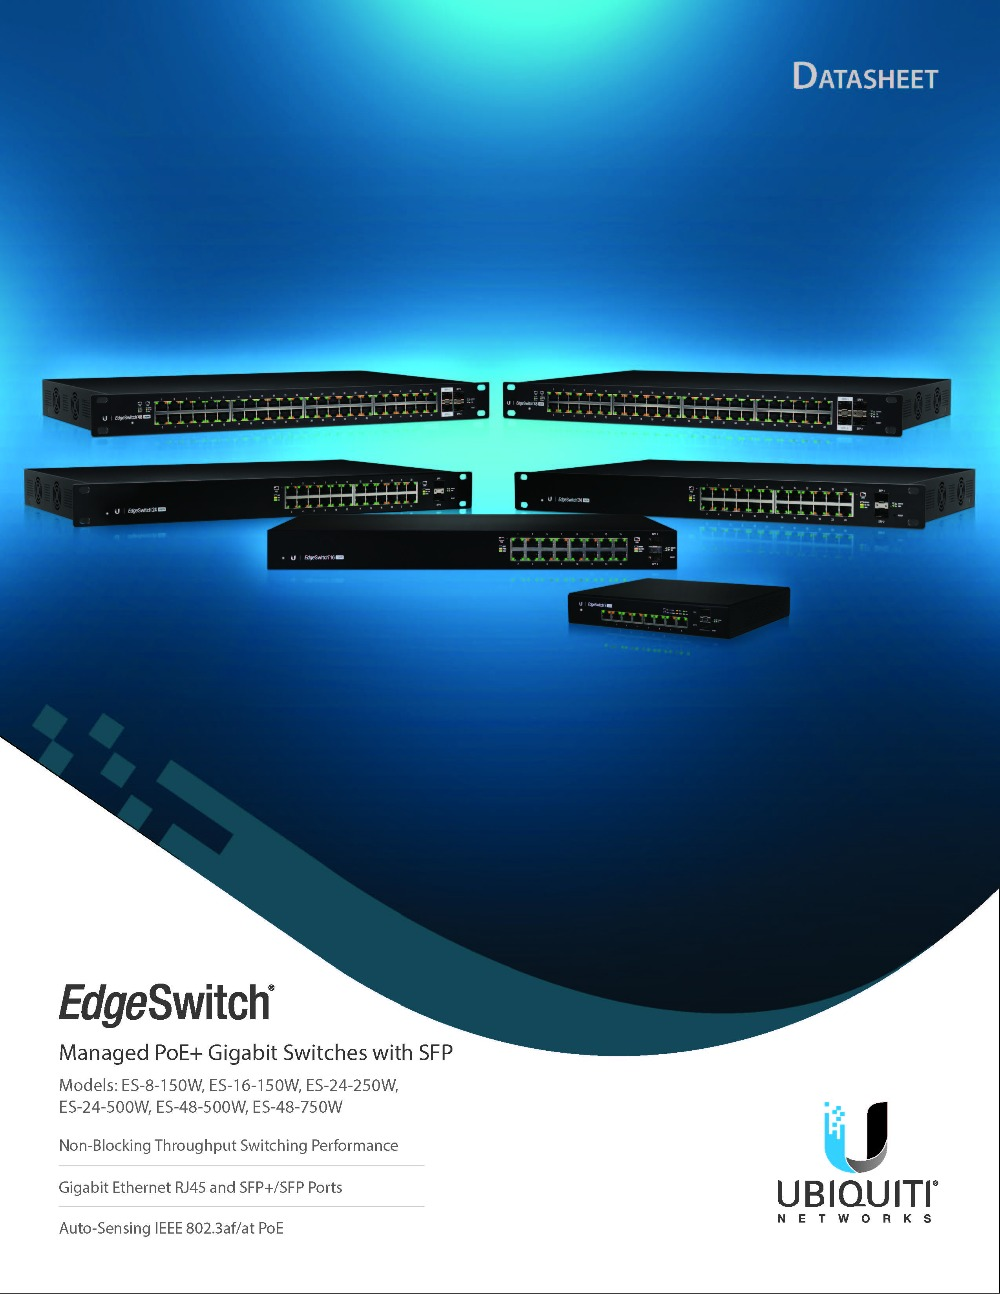 Ubiquiti ES-8-150W Edge Switch 8 PoE Port , 2 SFP Port UBNT Network Managed  PoE+ Gigabit Switch with SFP